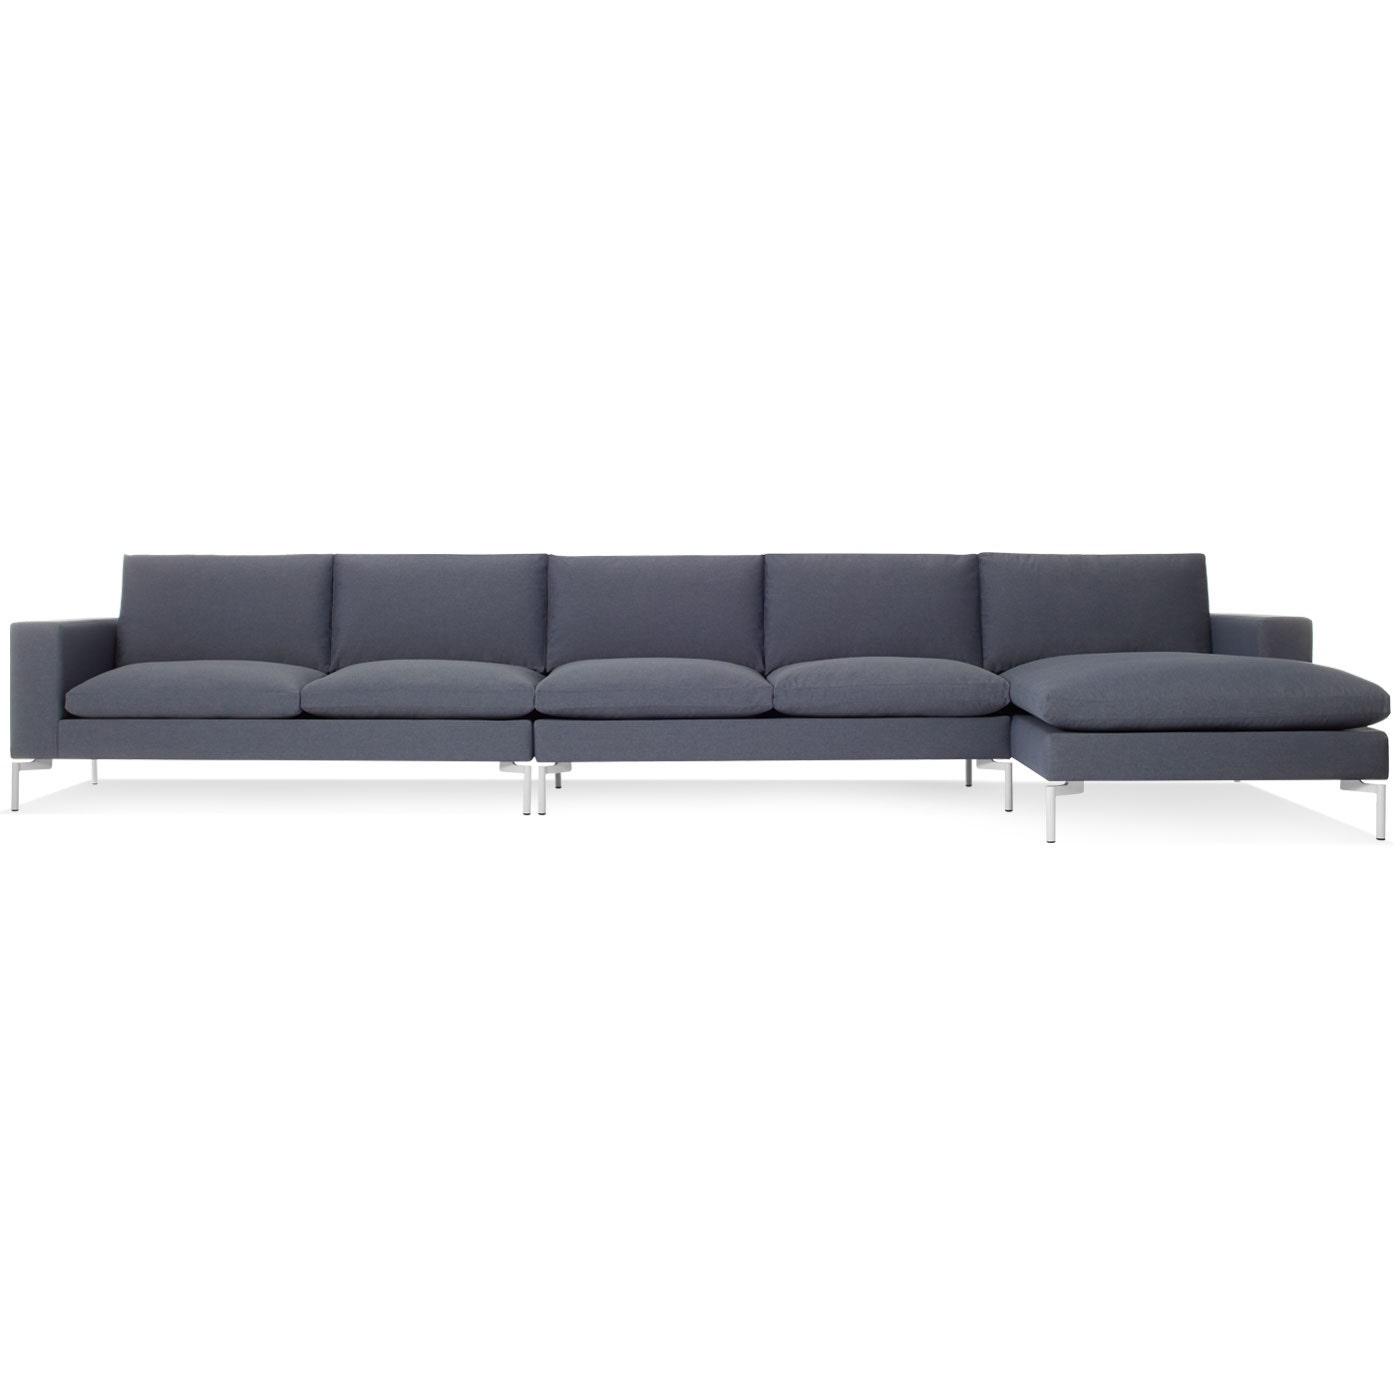 New Standard Medium Sectional Sofa Modern Sectional Sofas